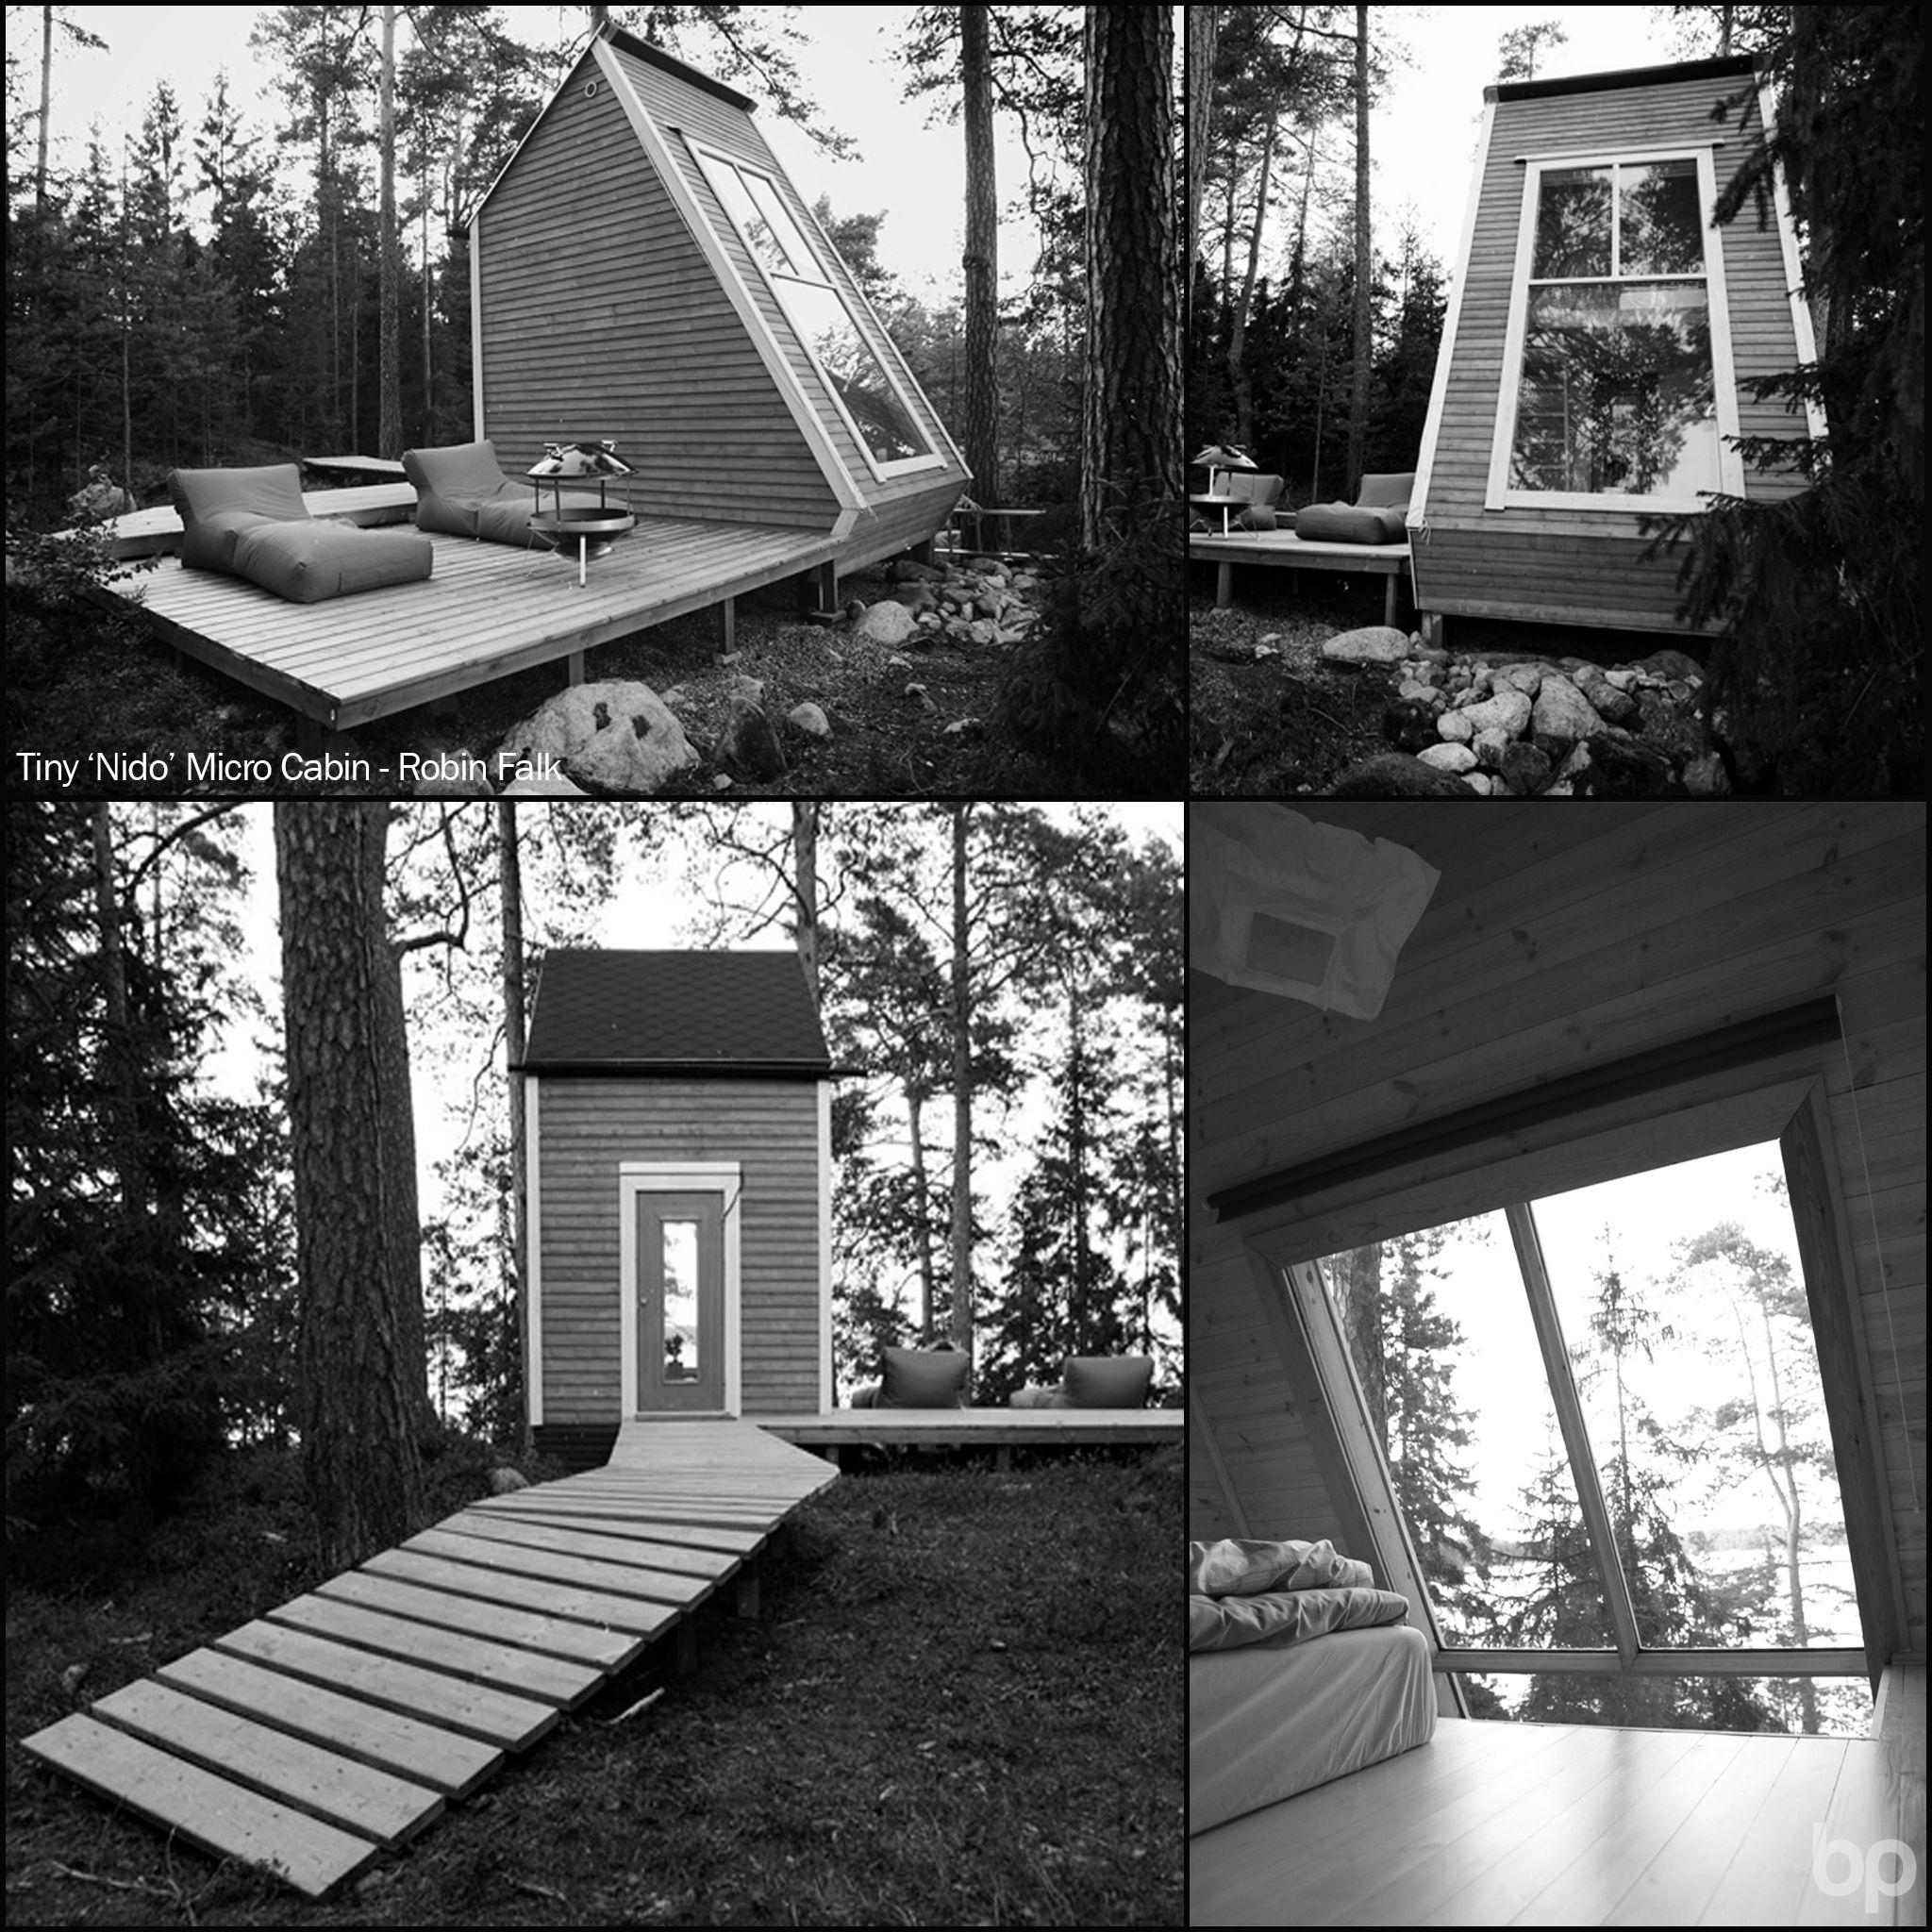 Tiny \'Nido\' Micro Cabin - Robin Falk.This little less than 9m2 ...